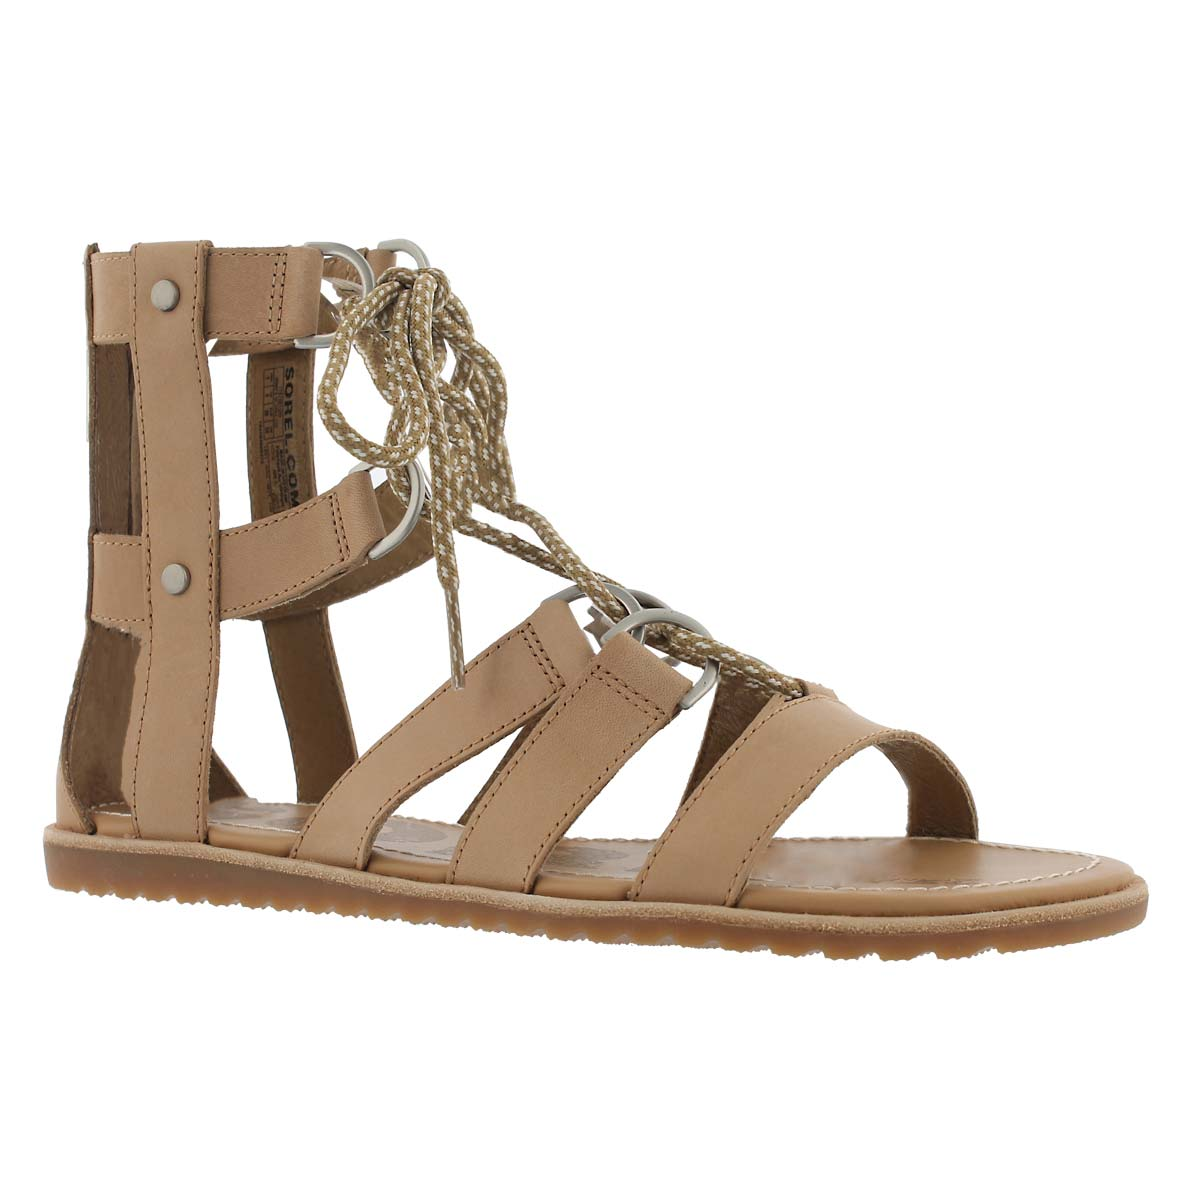 Women's ELLA lace up sahara casual sandals